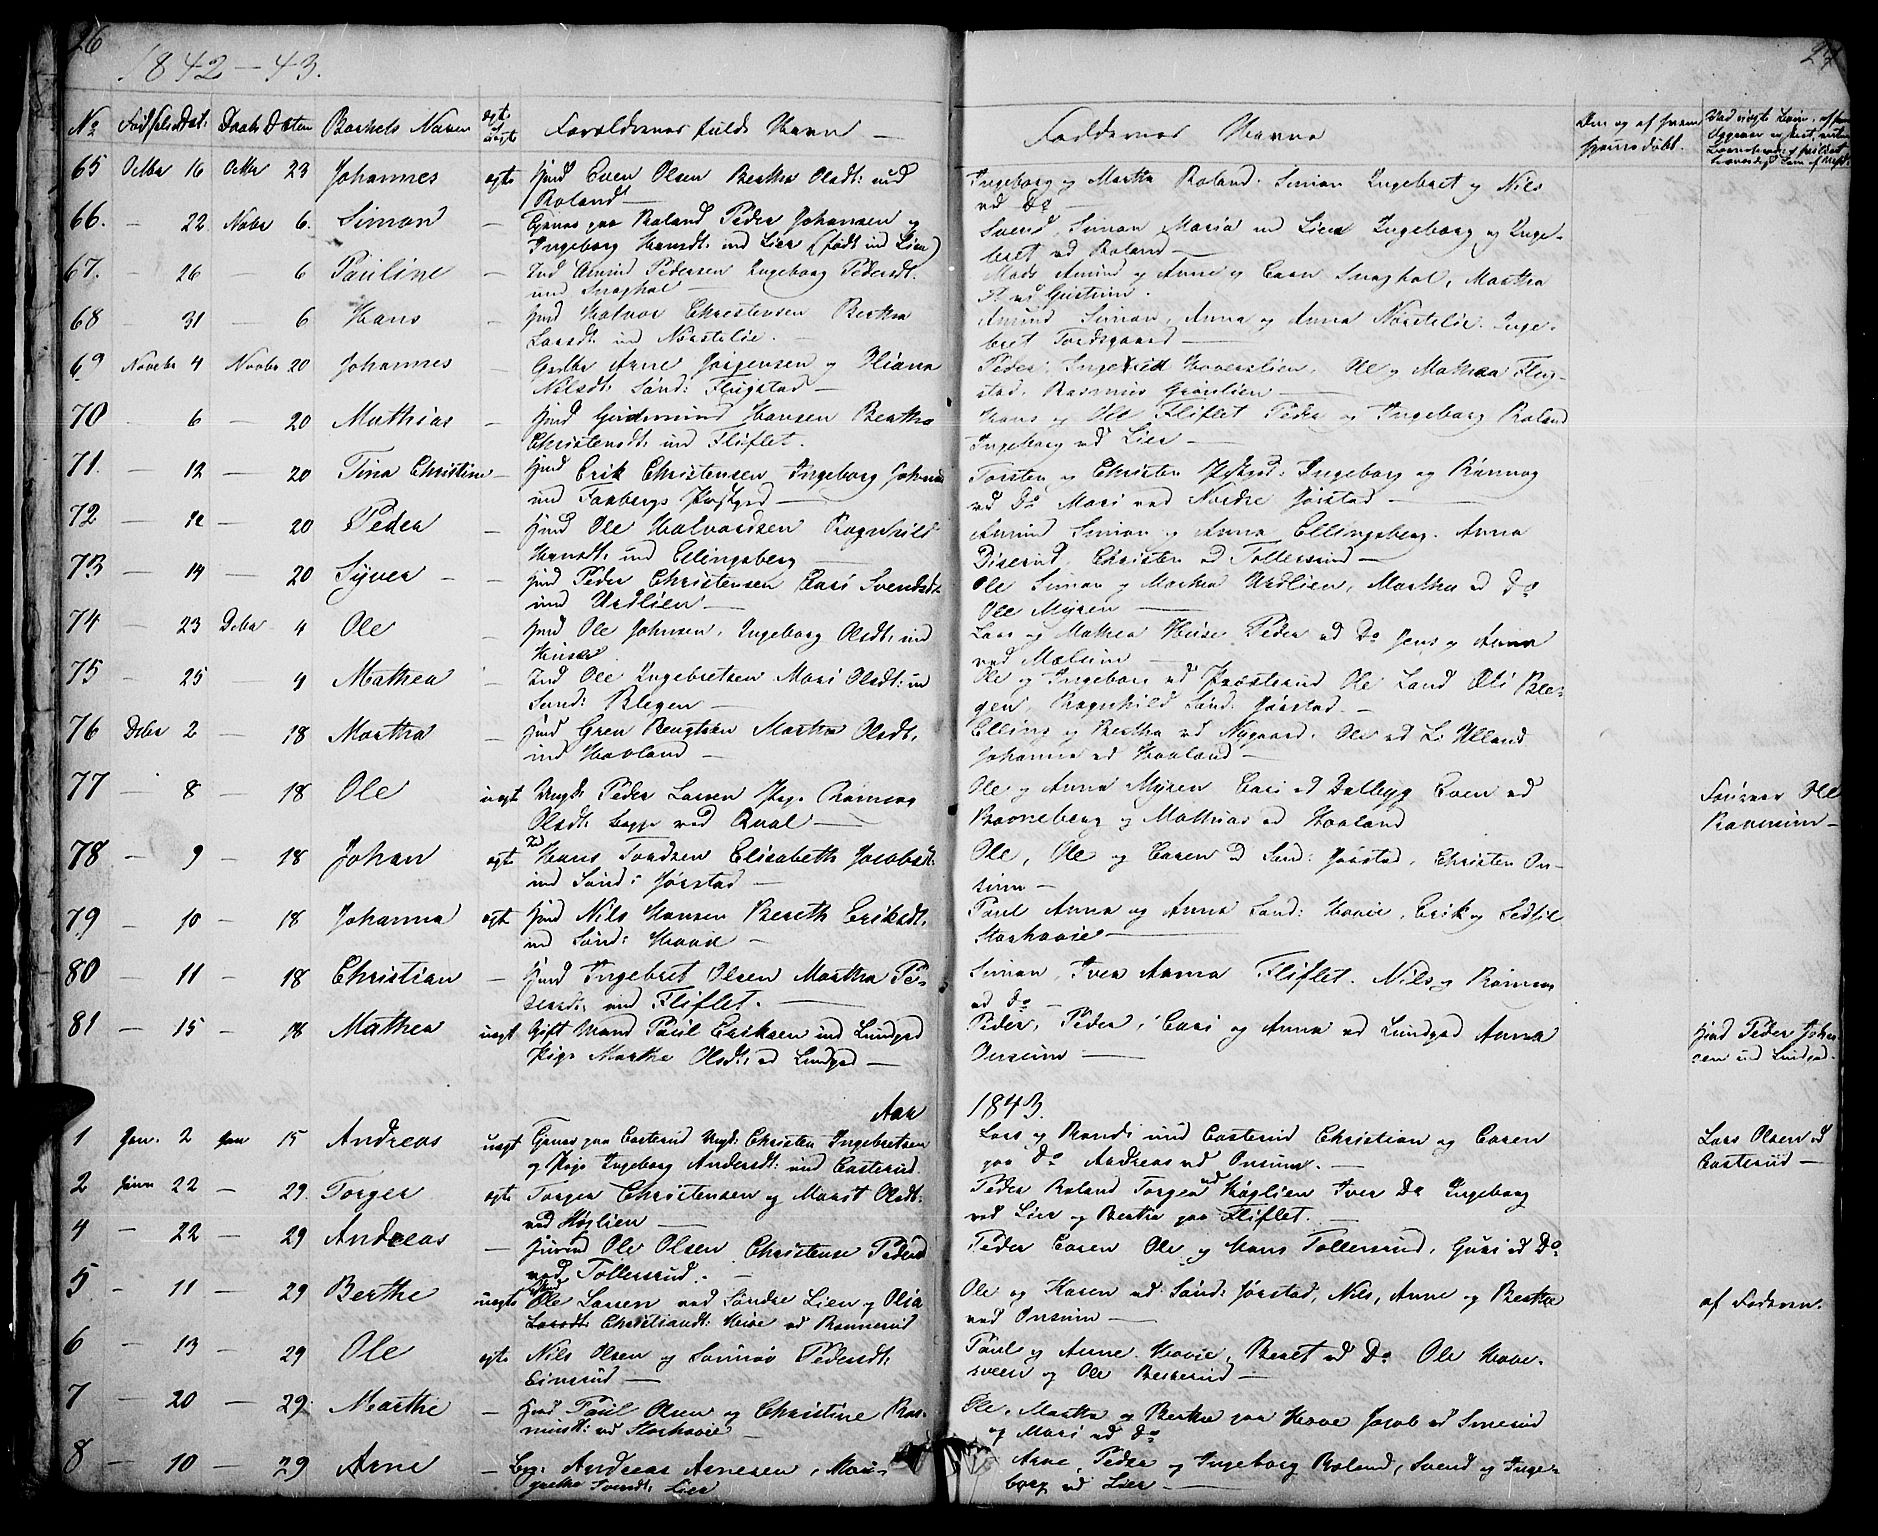 SAH, Fåberg prestekontor, Klokkerbok nr. 5, 1837-1864, s. 26-27